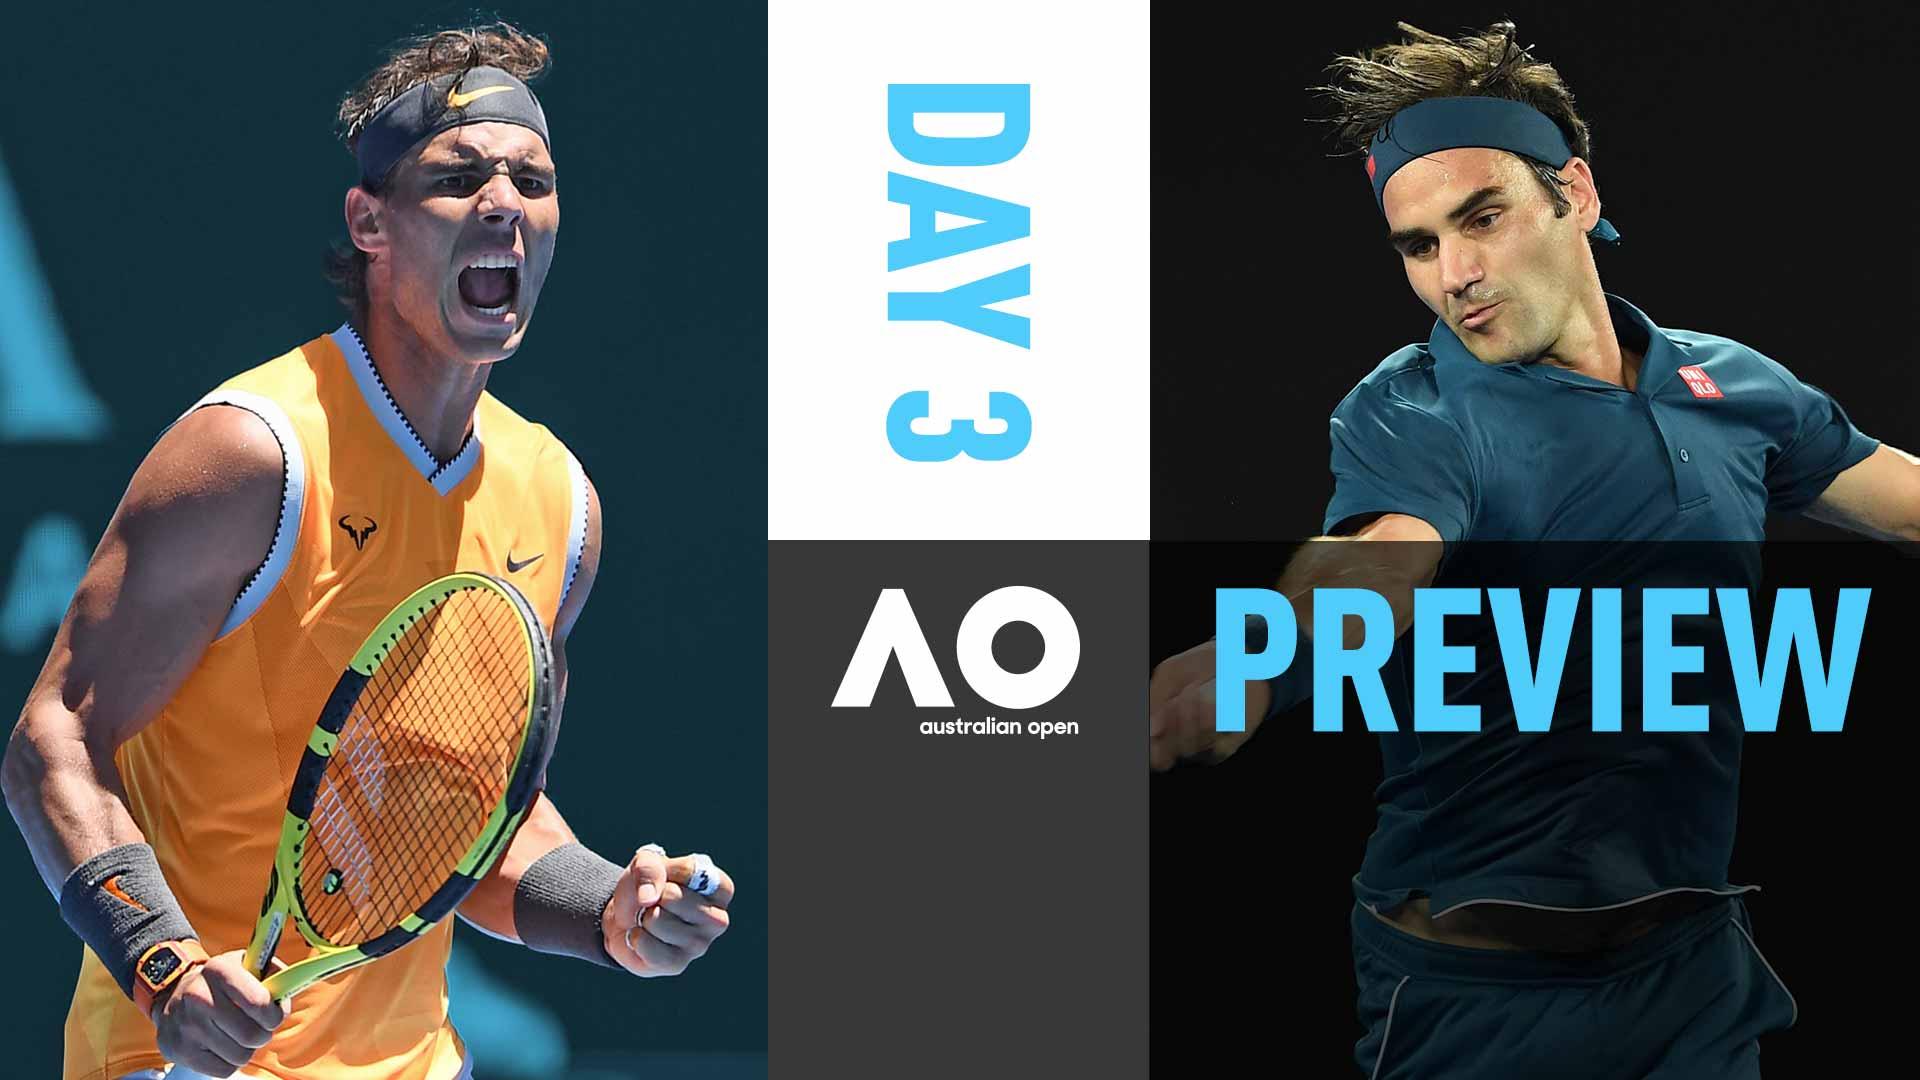 Day 3 Preview: Nadal & Federer Continue Title Pursuit | ATP Tour | Tennis